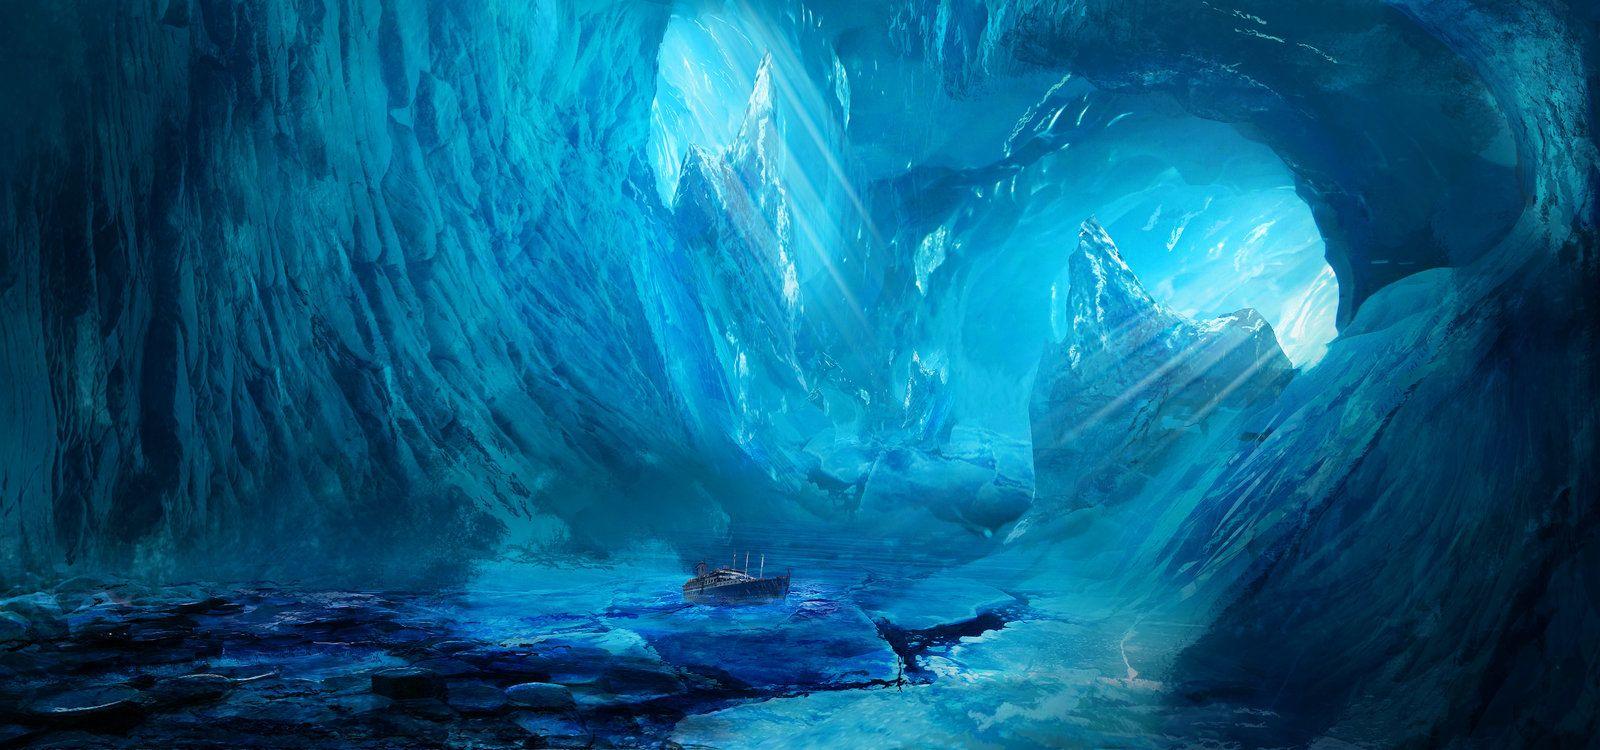 Cave, Steven Richards on ArtStation at https://www.artstation.com/artwork/cave-88fe9eb4-0b2d-49f1-a58d-1191432d64e5